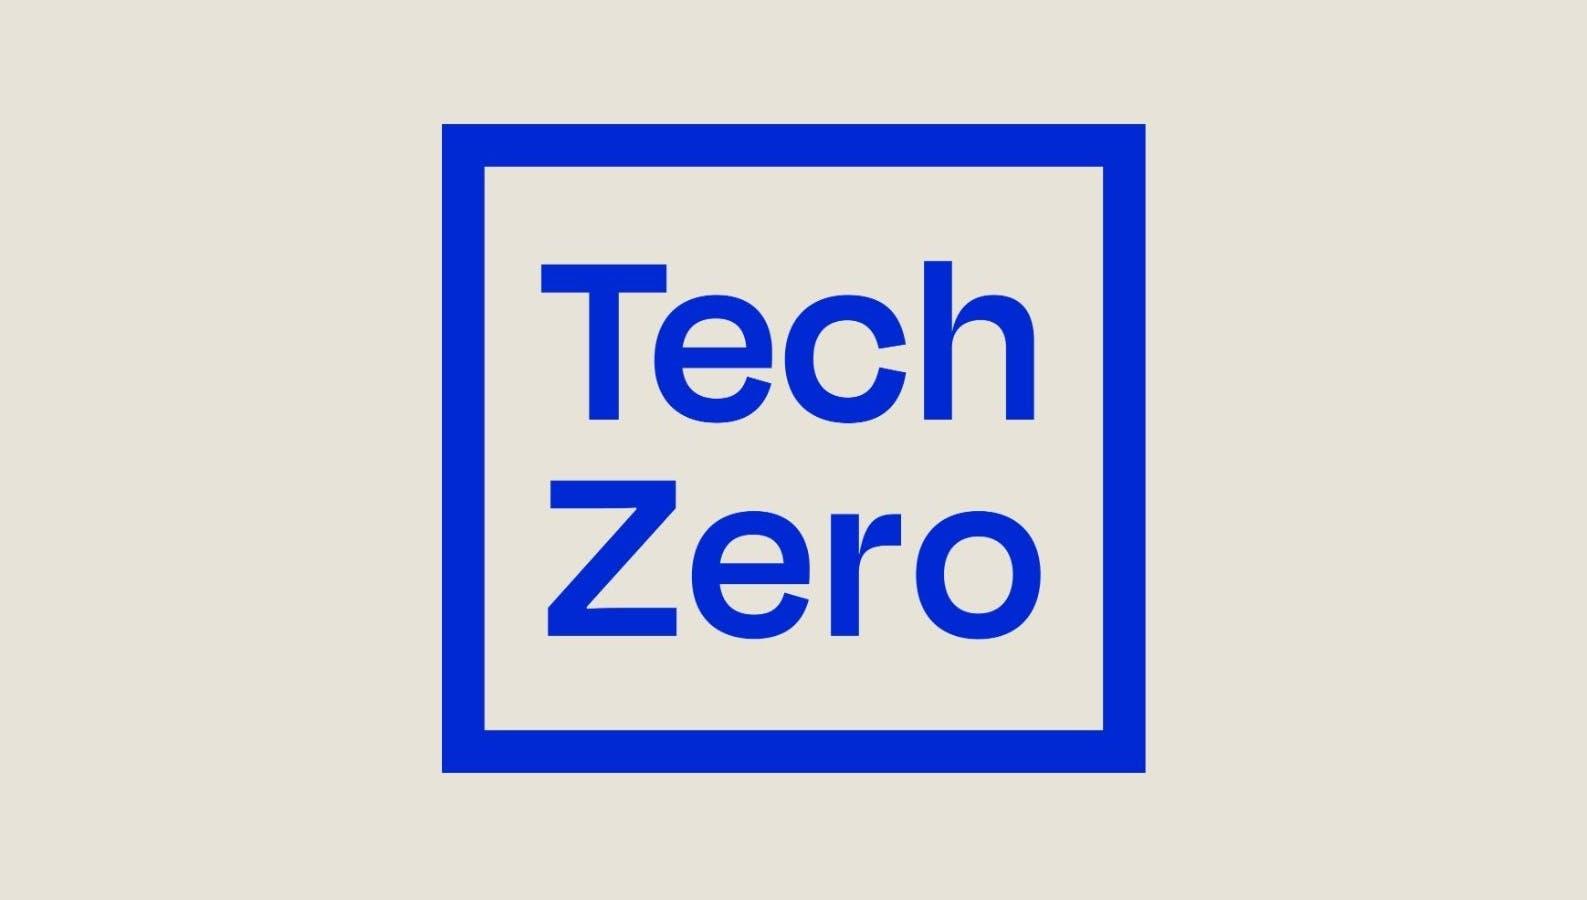 tech zero poster